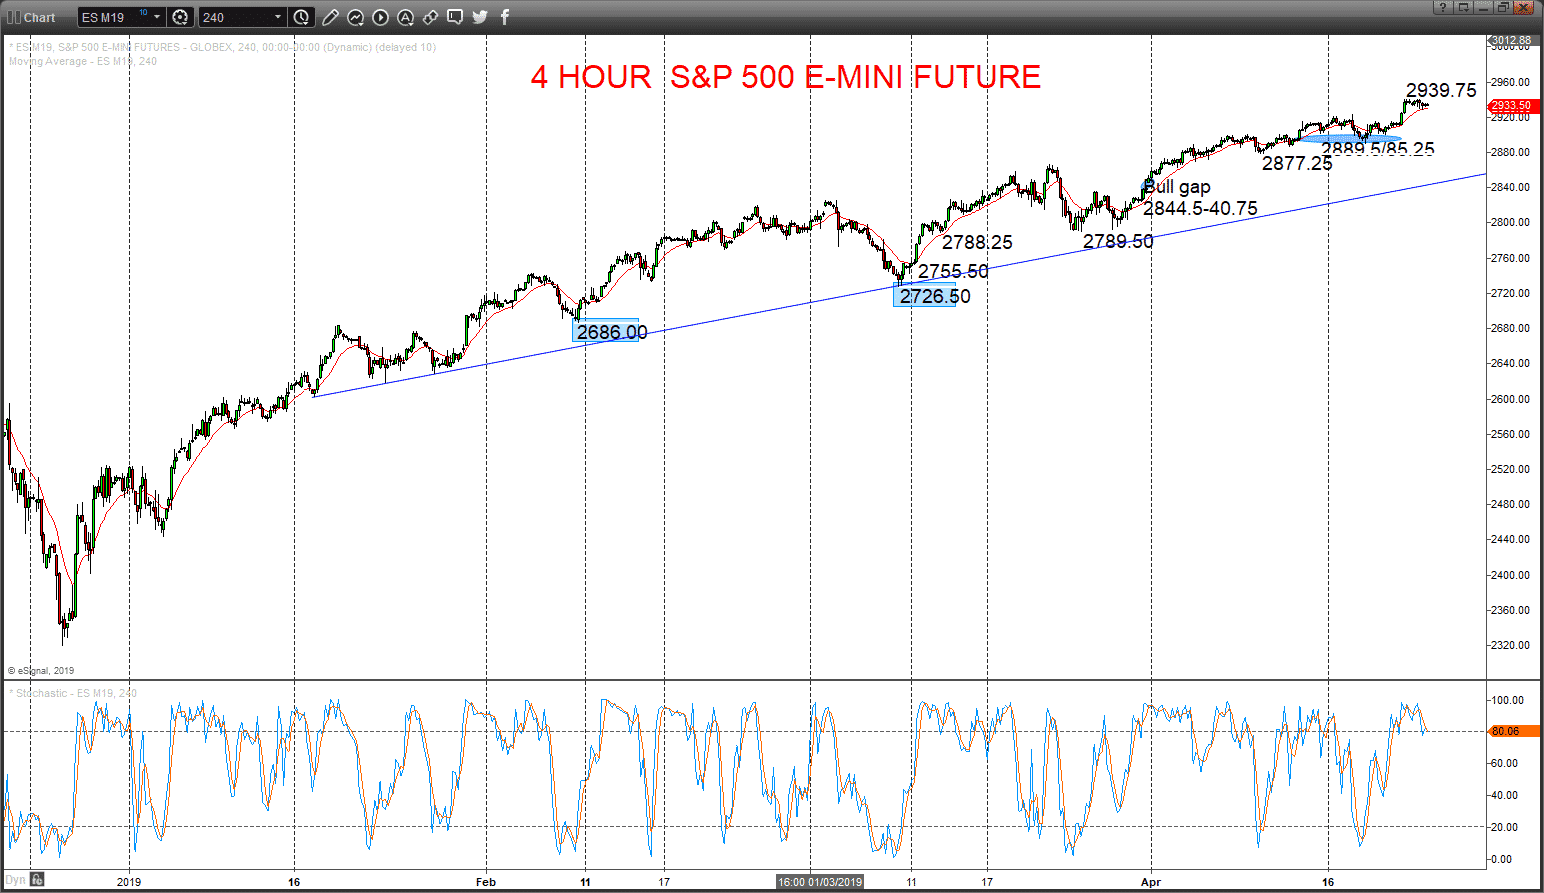 Equites stay bullish and US$ soars, sending EURUSD bear signal Image